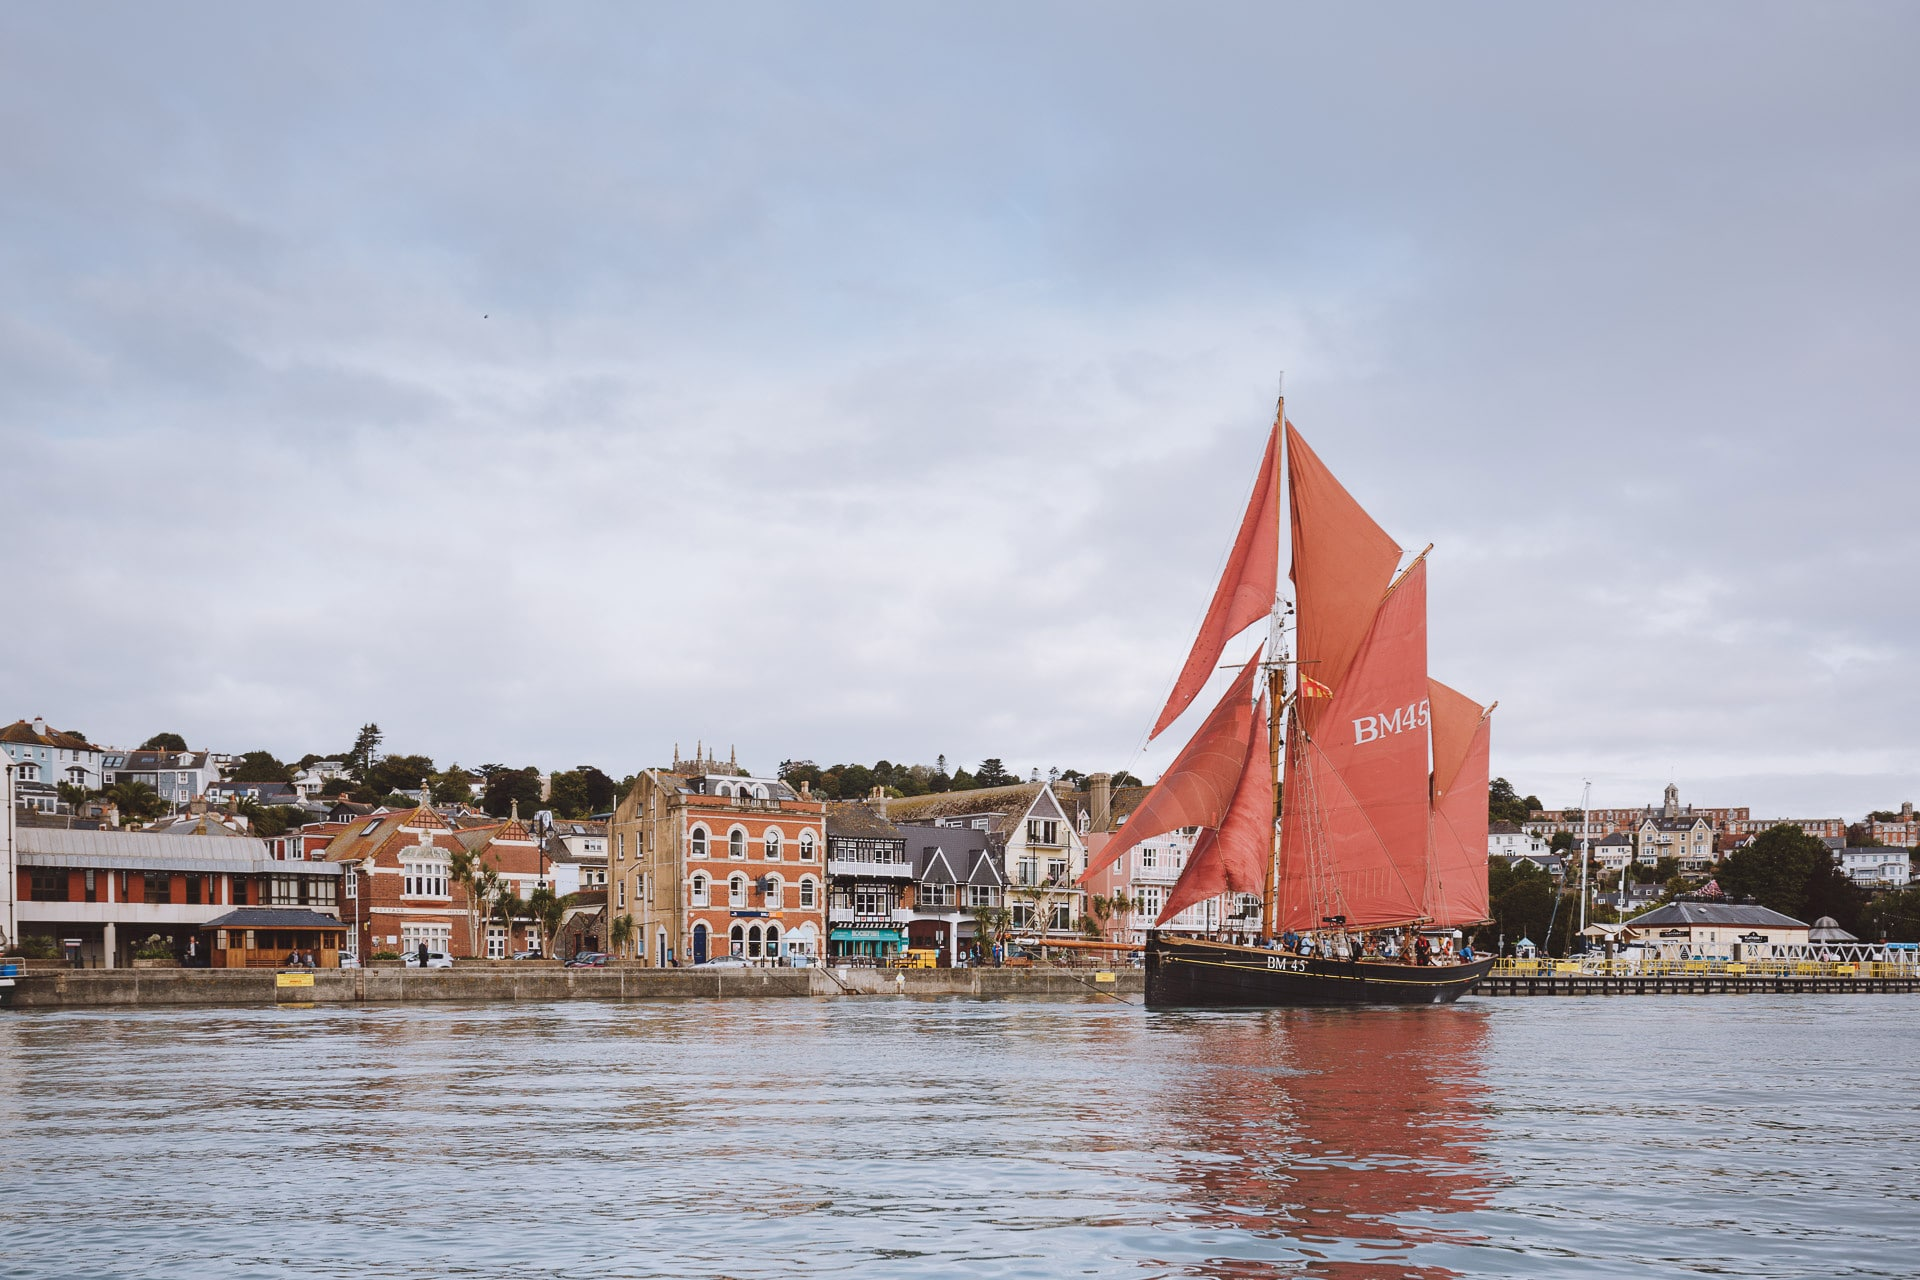 Pilgrim-fullsail-Dartmouth-harbour